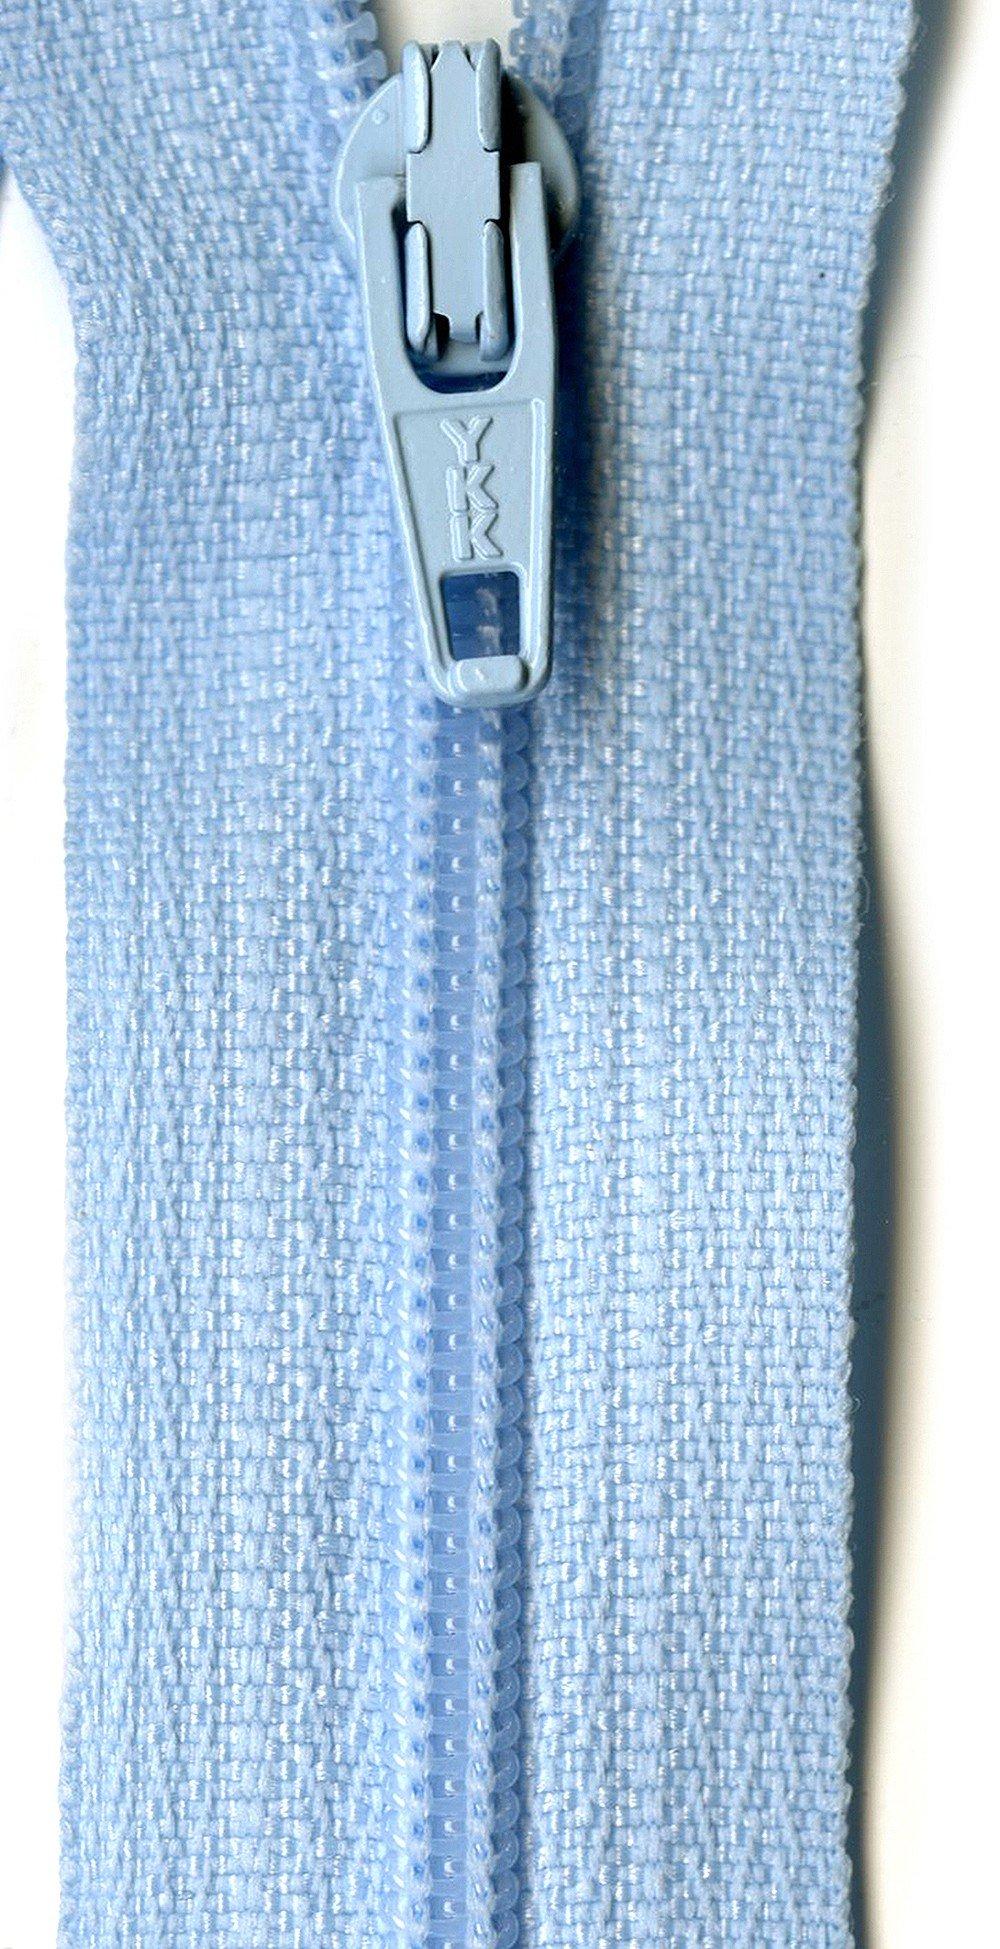 American & Efird Ziplon Coil Zipper 14''-Baby Blue by American & Efird